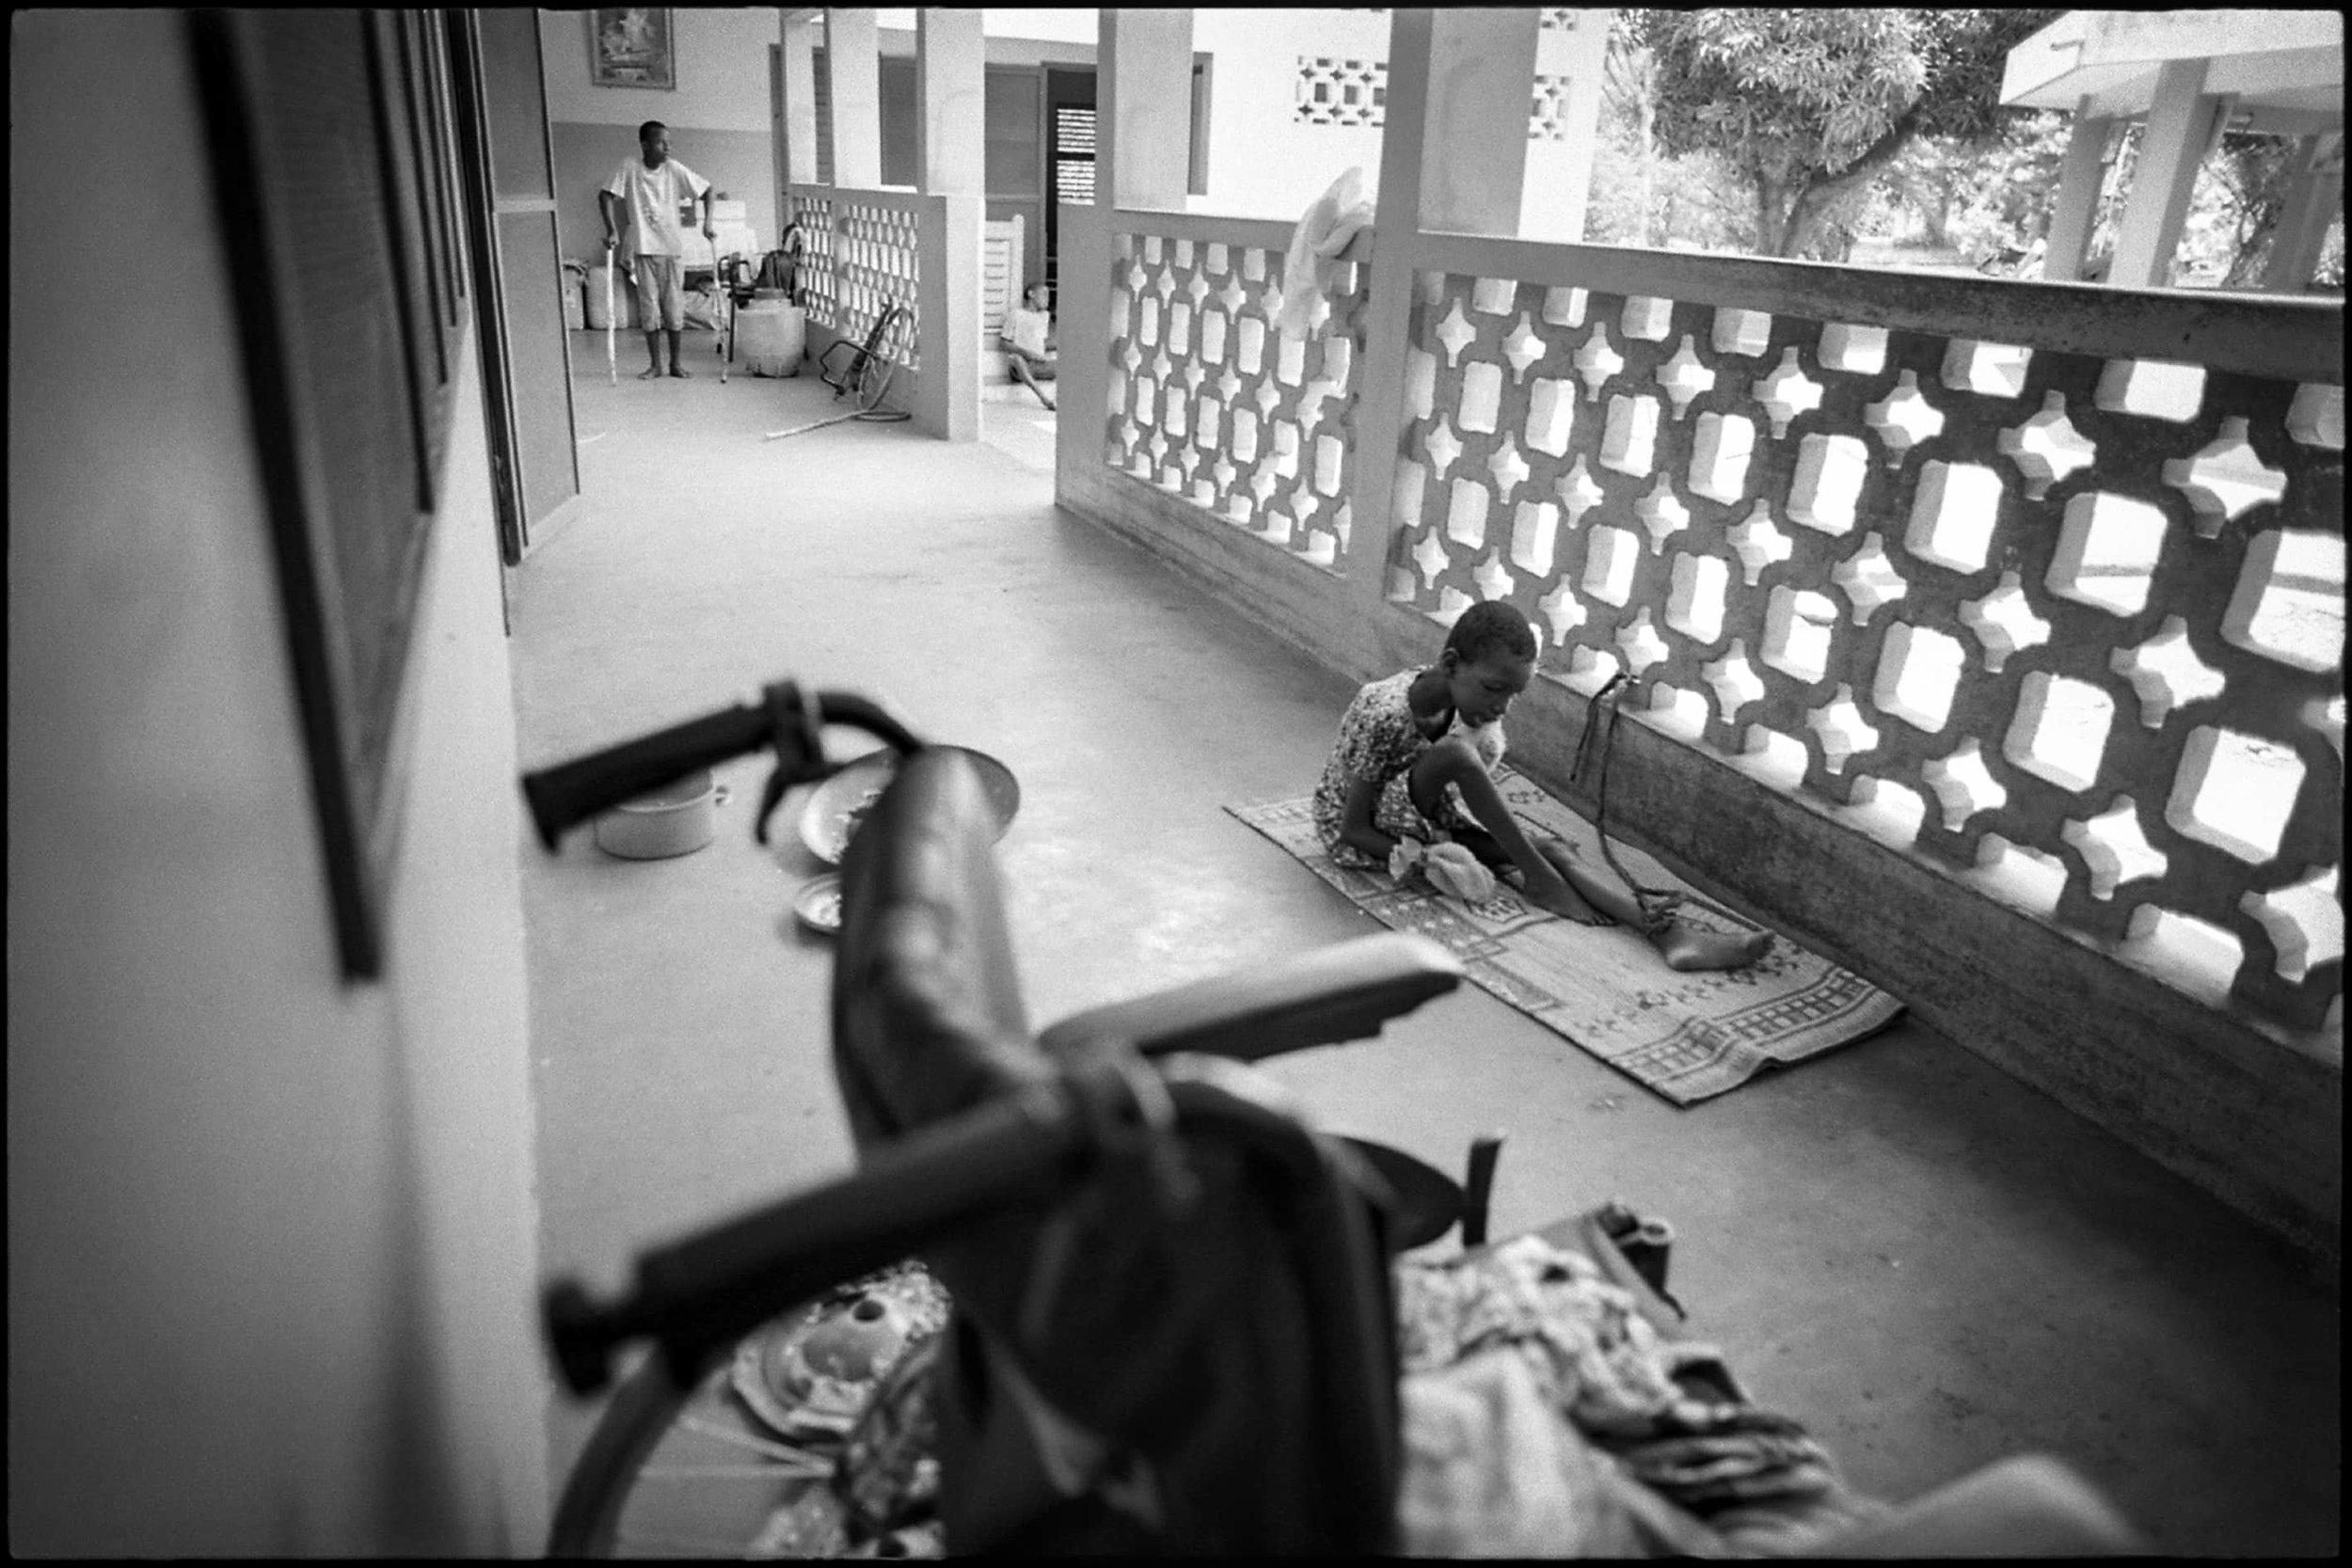 documentary-reportage-centre-les-archanges-fabio-burrelli-3.jpg